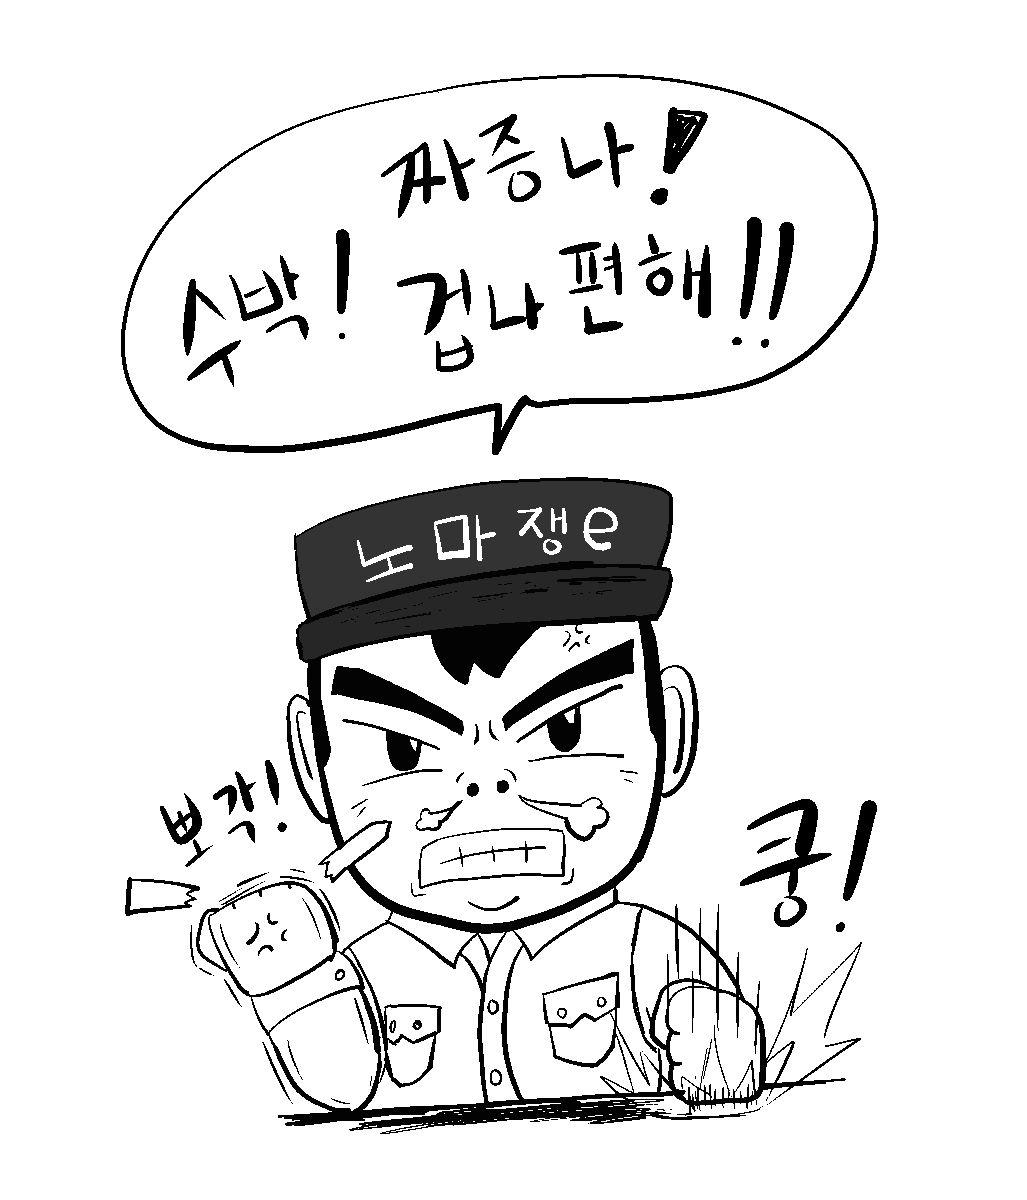 XPPEN ARTIST 12 로 그린 nomacat 작가 노마쟁이 분노 그림 그림, 작가 및 블로그